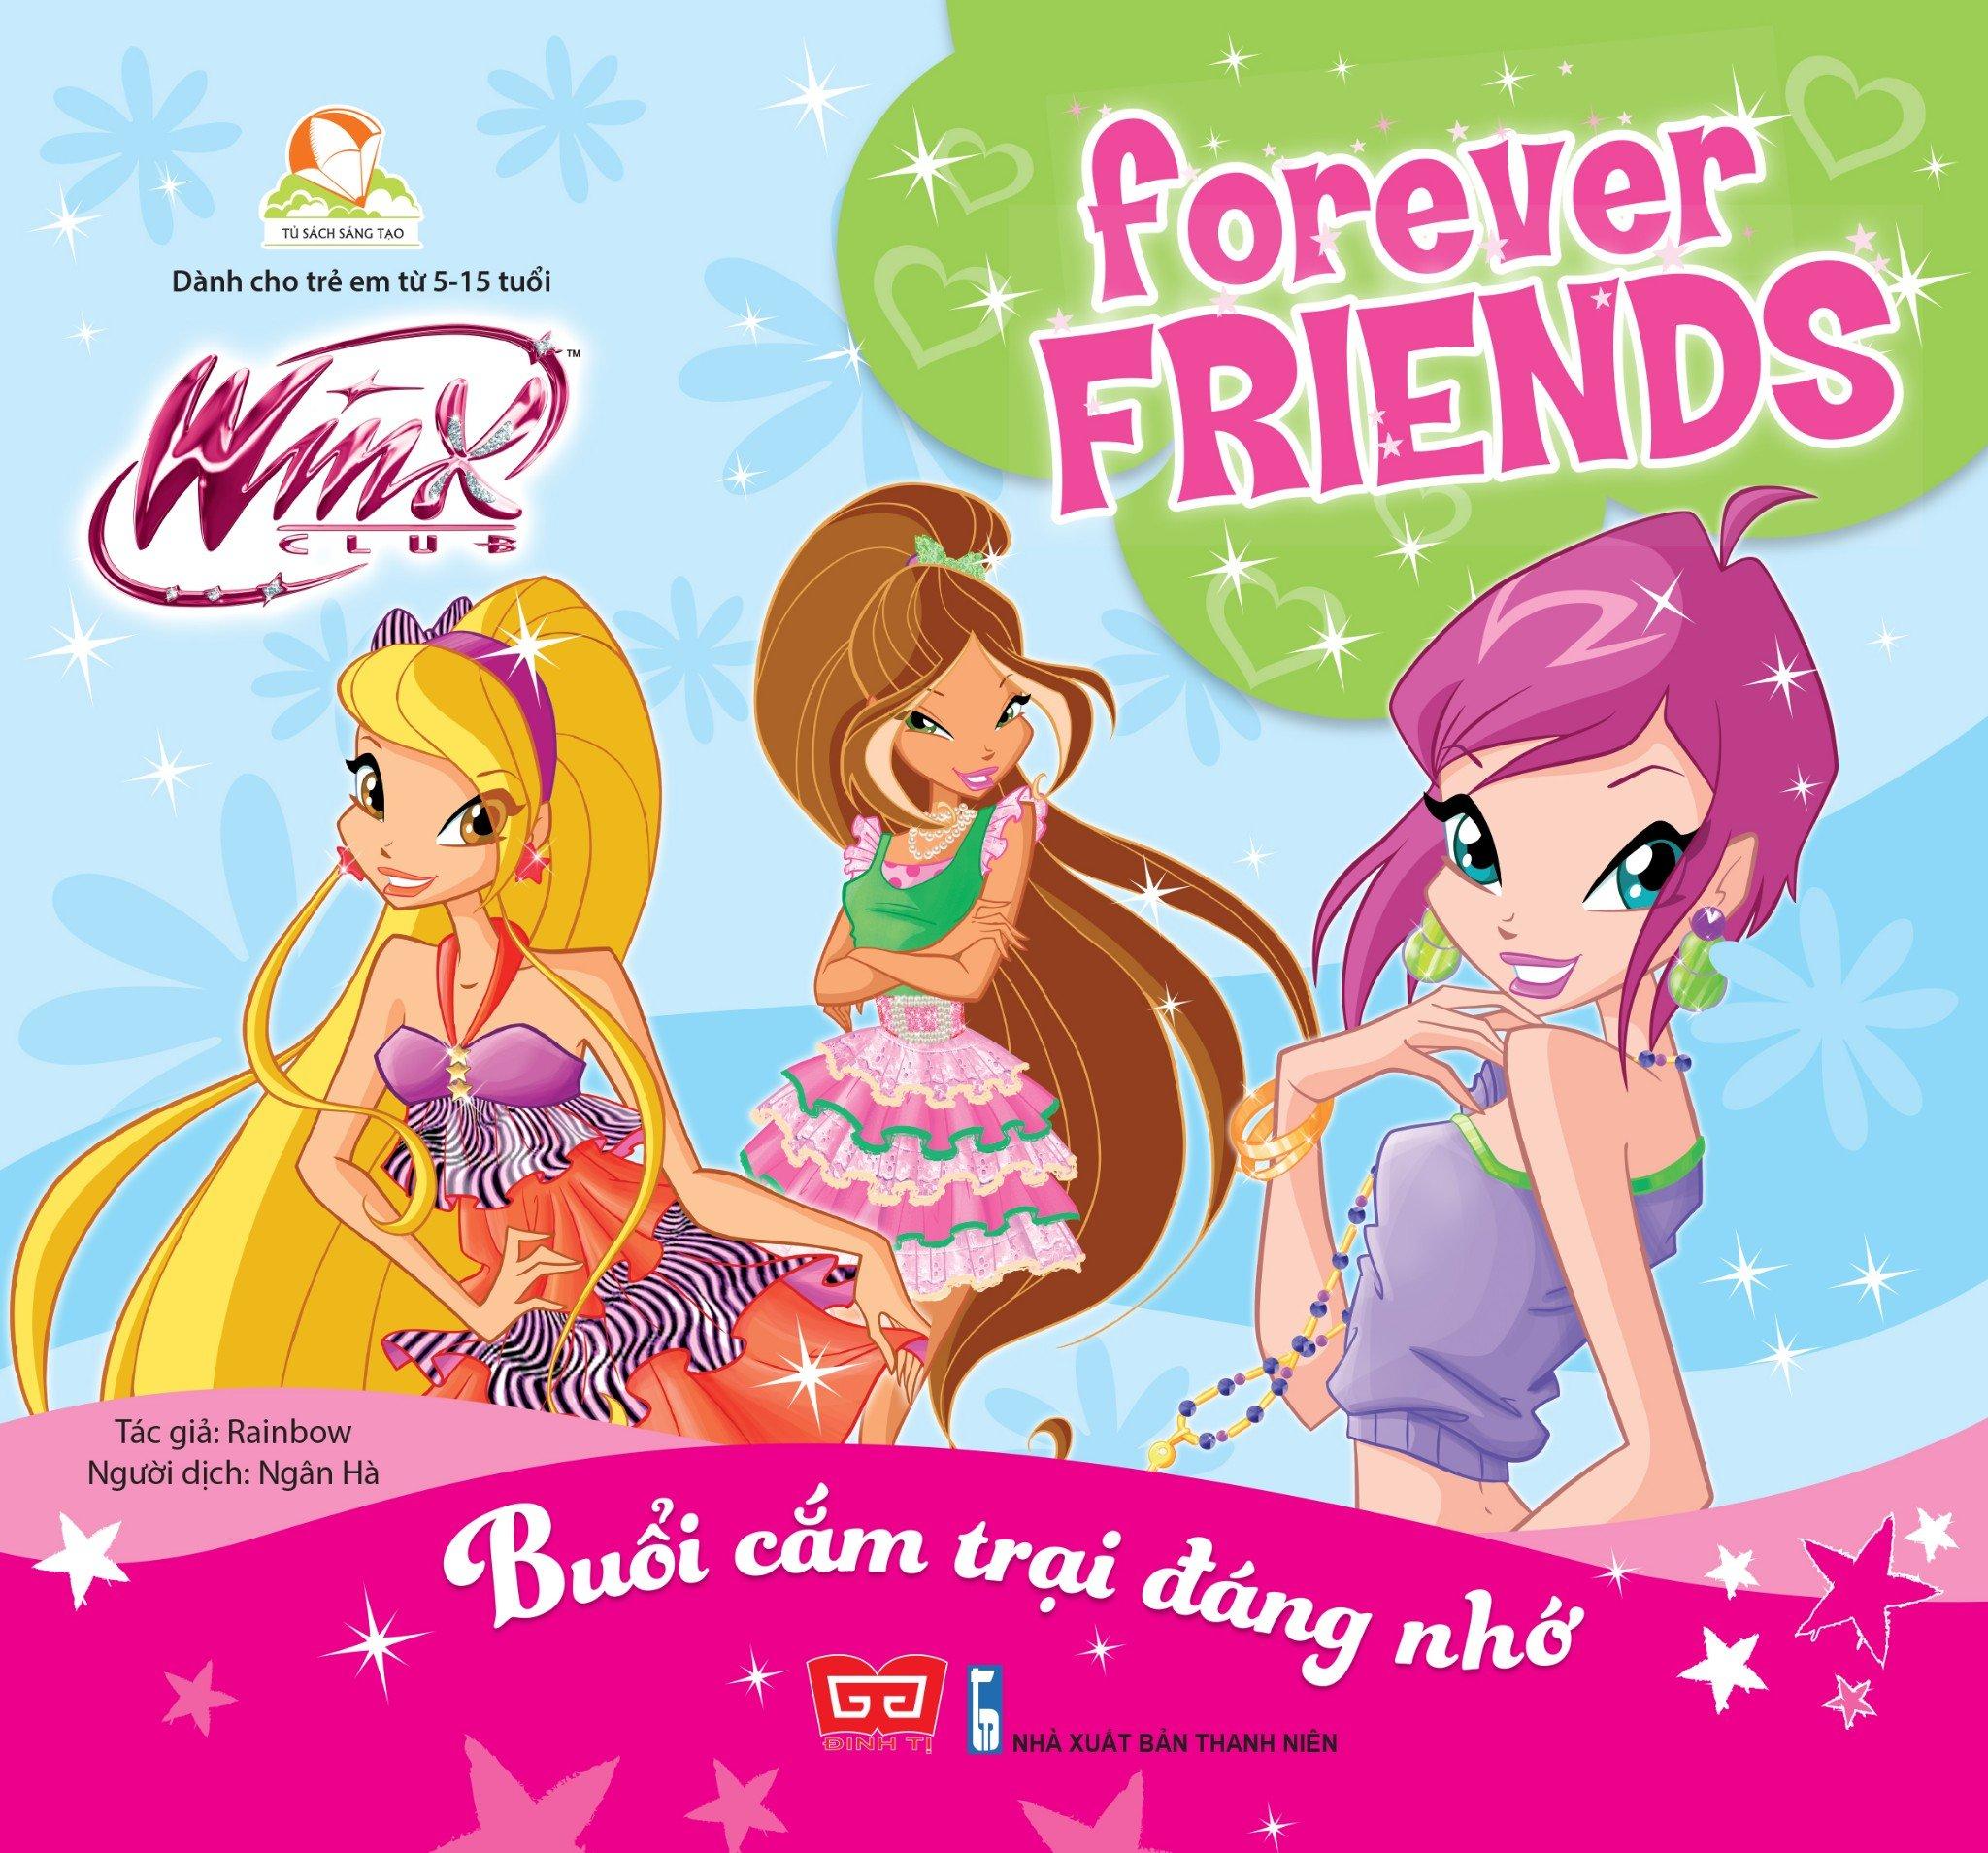 Winx club - Forever Friends - Buổi cắm trại đáng nhớ